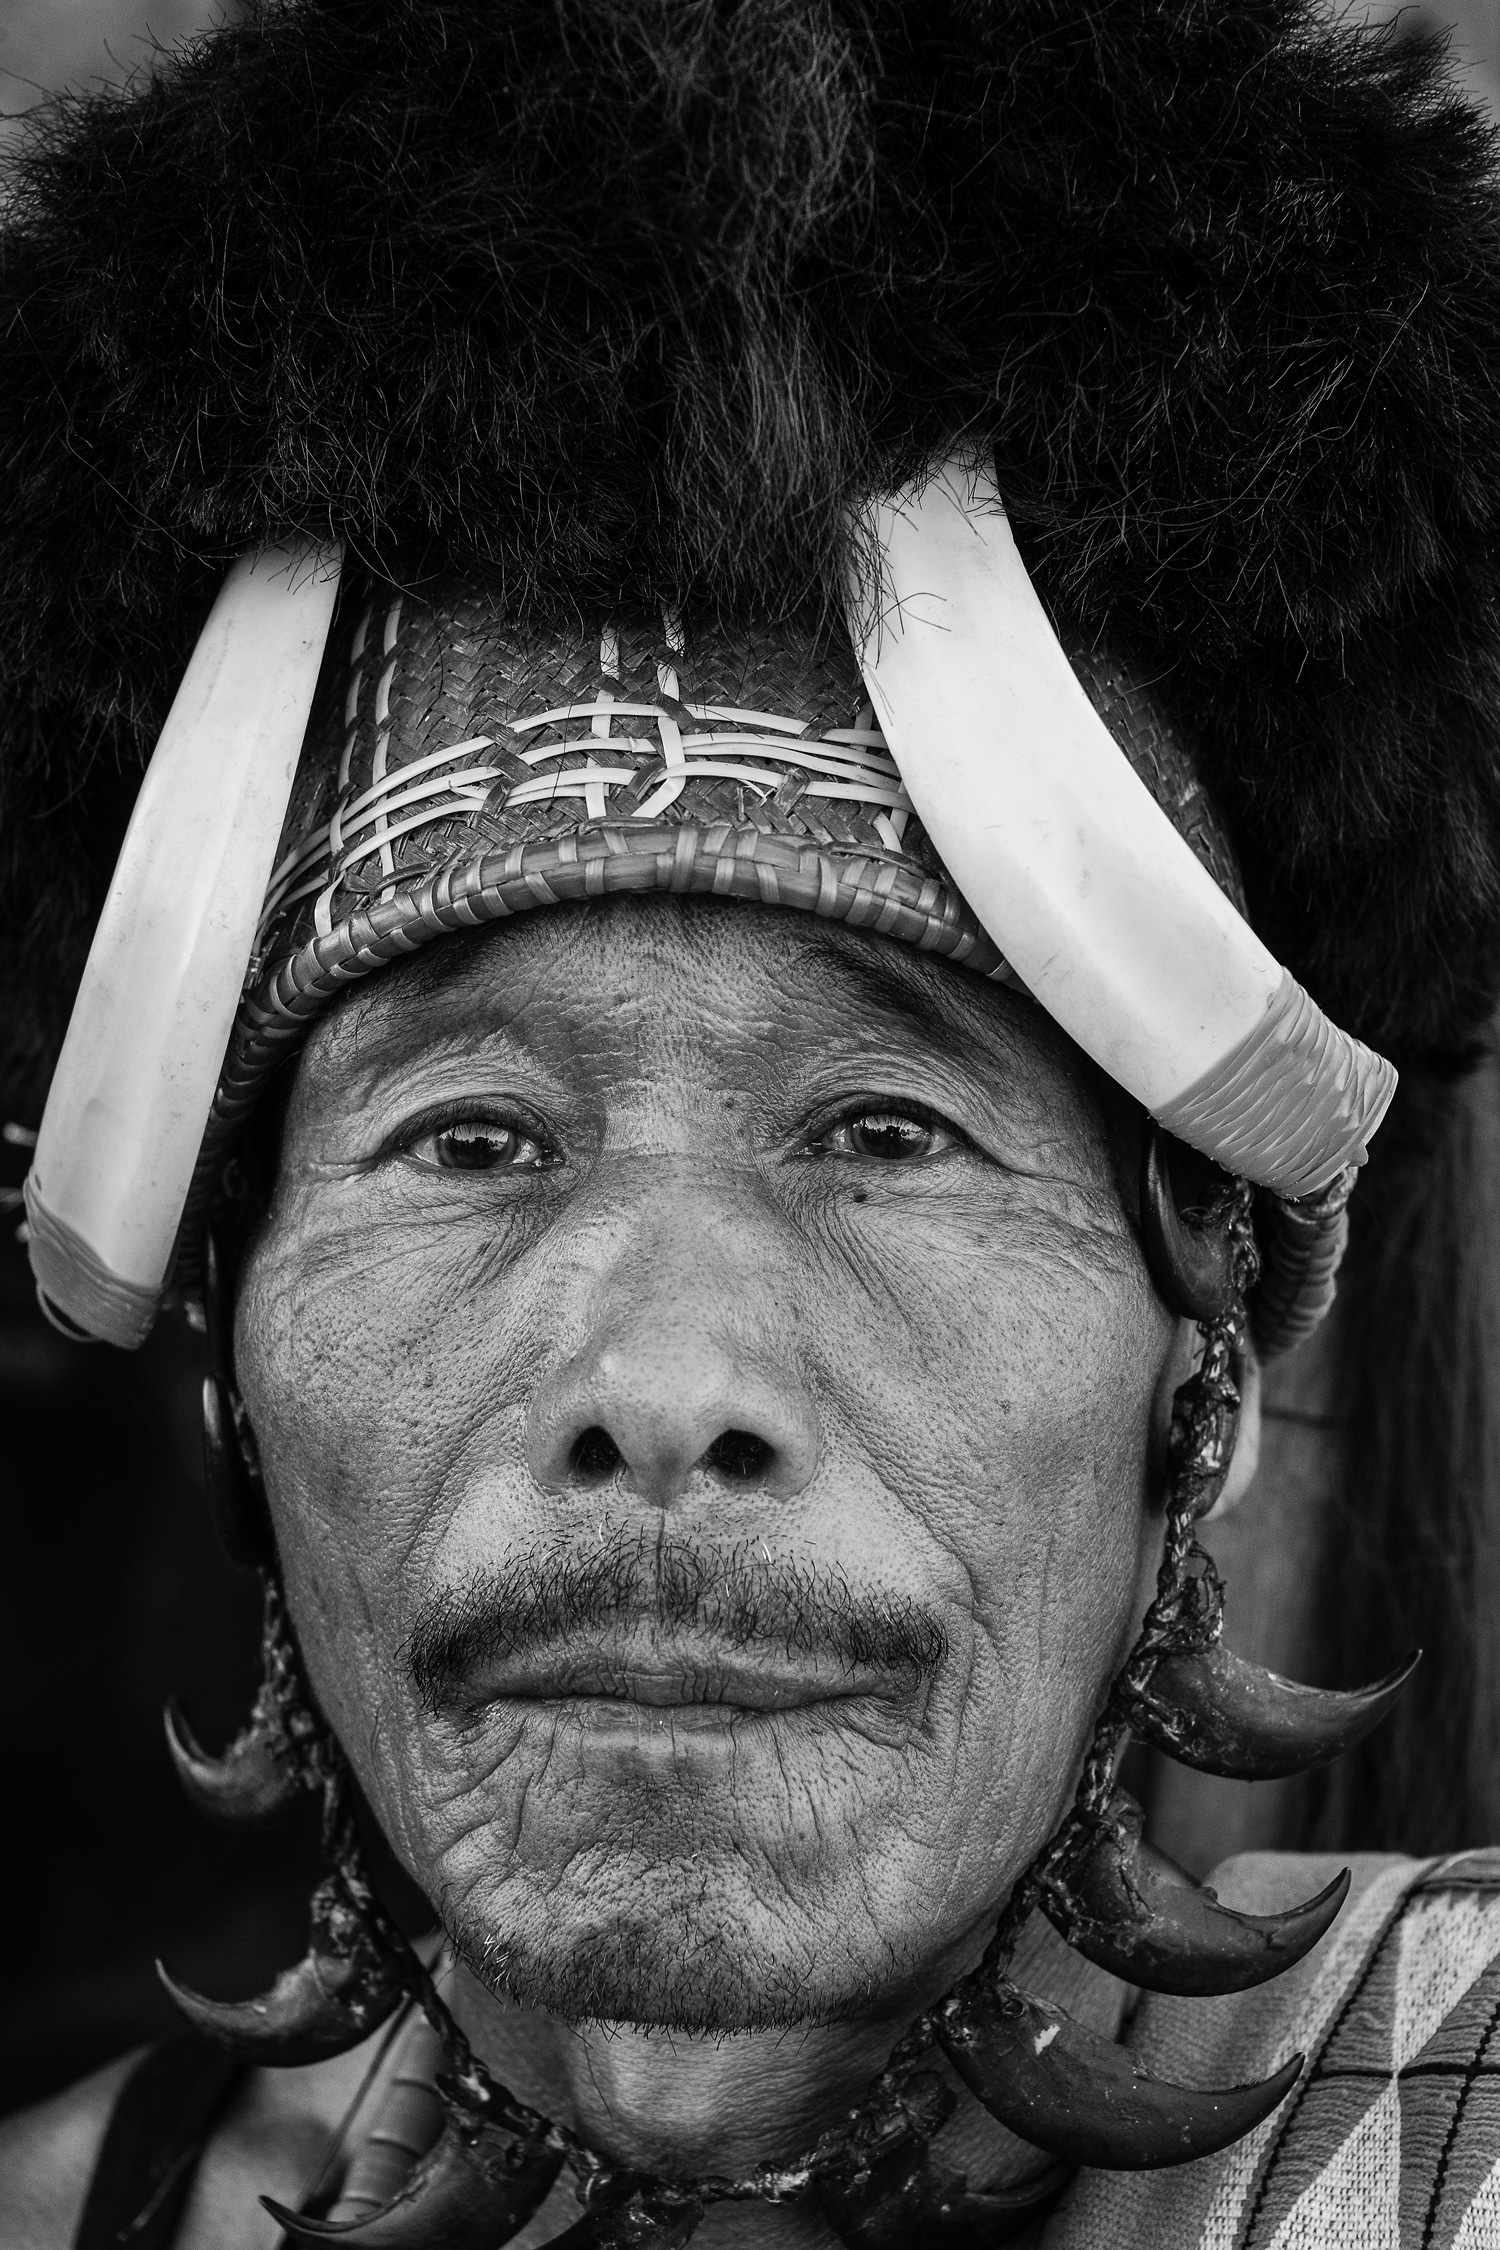 Portrait of a Naga Elder in traditional headgear